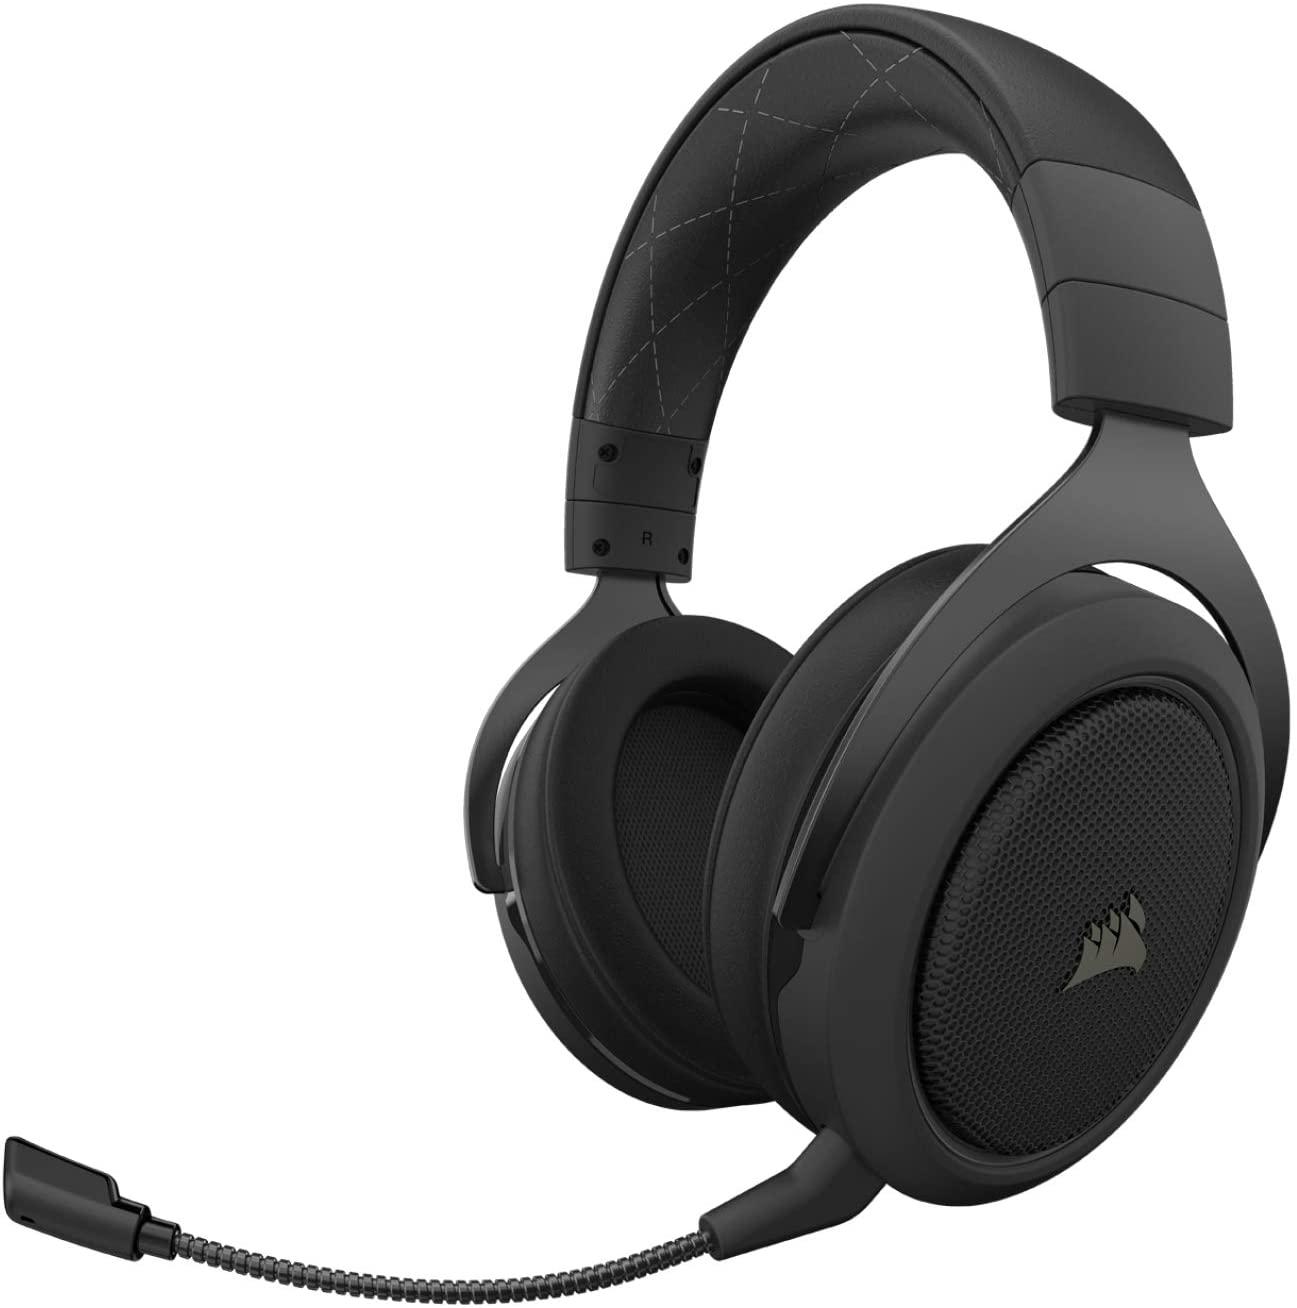 Corsair HS70 Pro Wireless